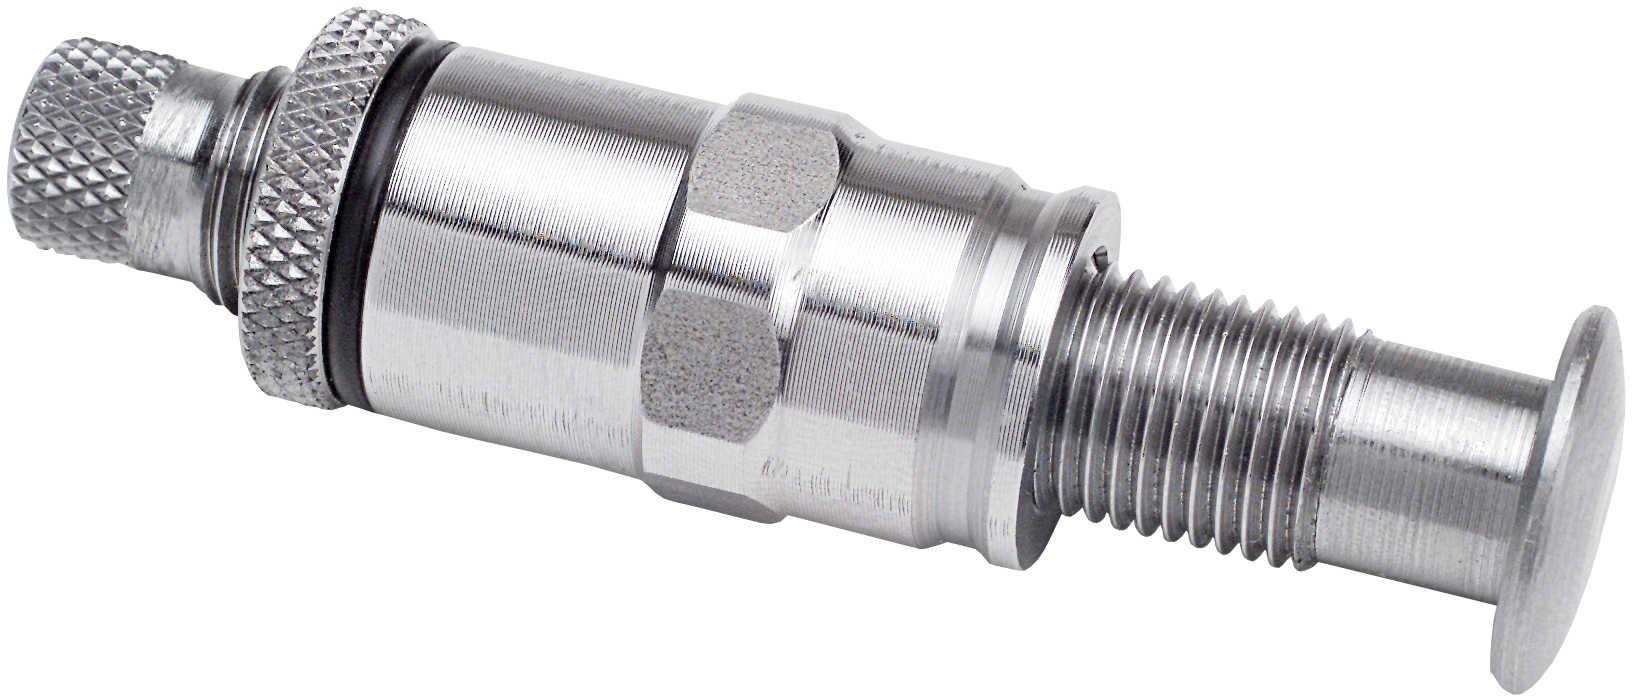 Hornady Lock-N-Load Powder Measure Standard Metering Assembly Md: 050120